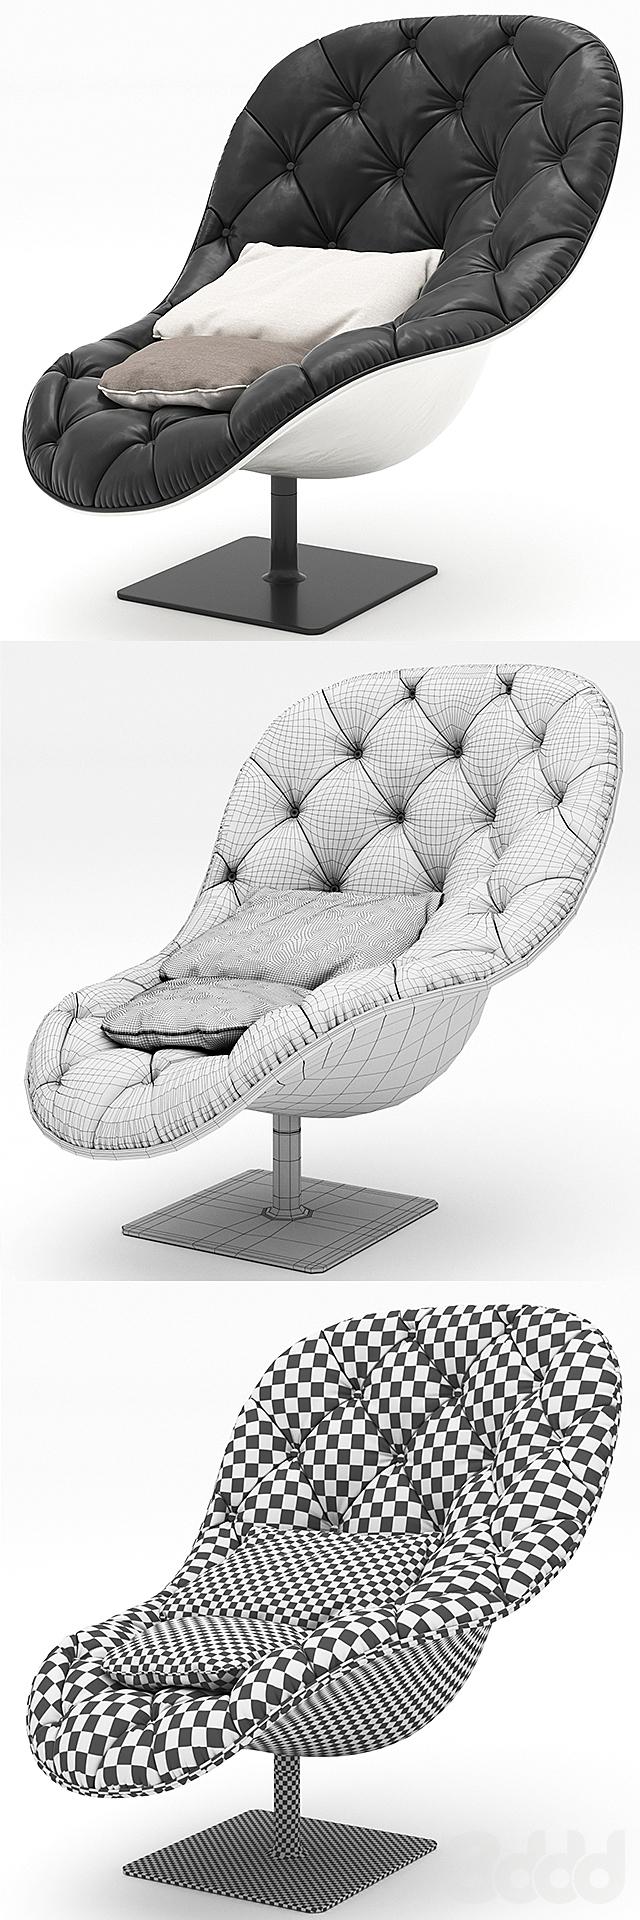 Moroso Bohemian, armchair